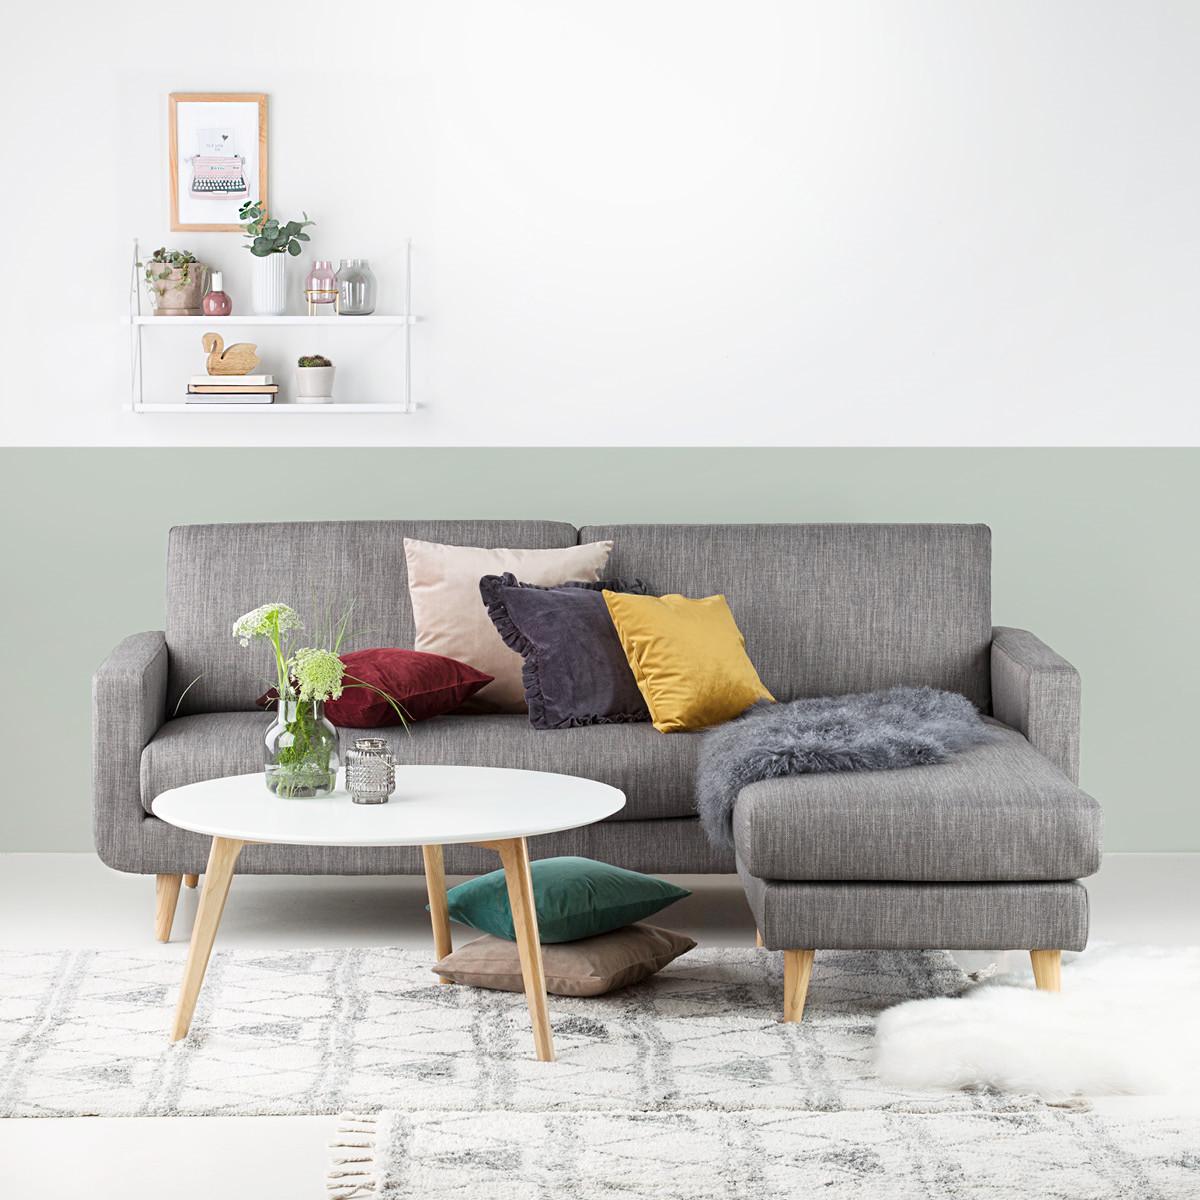 florida chaiselong mini gr k b her. Black Bedroom Furniture Sets. Home Design Ideas